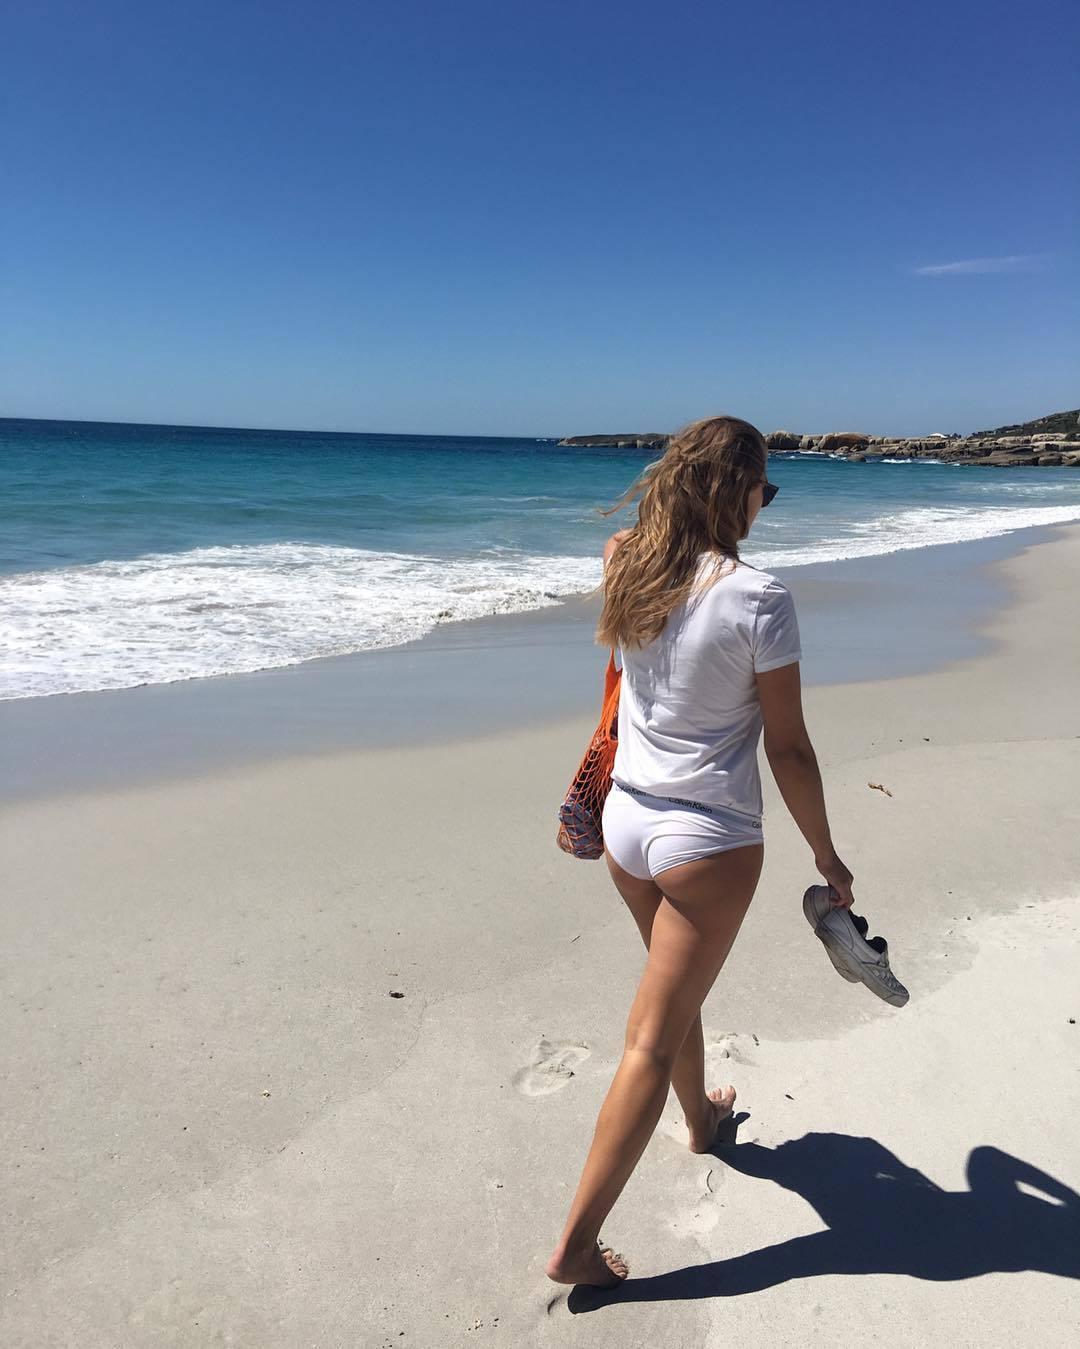 Feet Christine Sofie Johansen nudes (25 foto and video), Tits, Fappening, Twitter, legs 2019